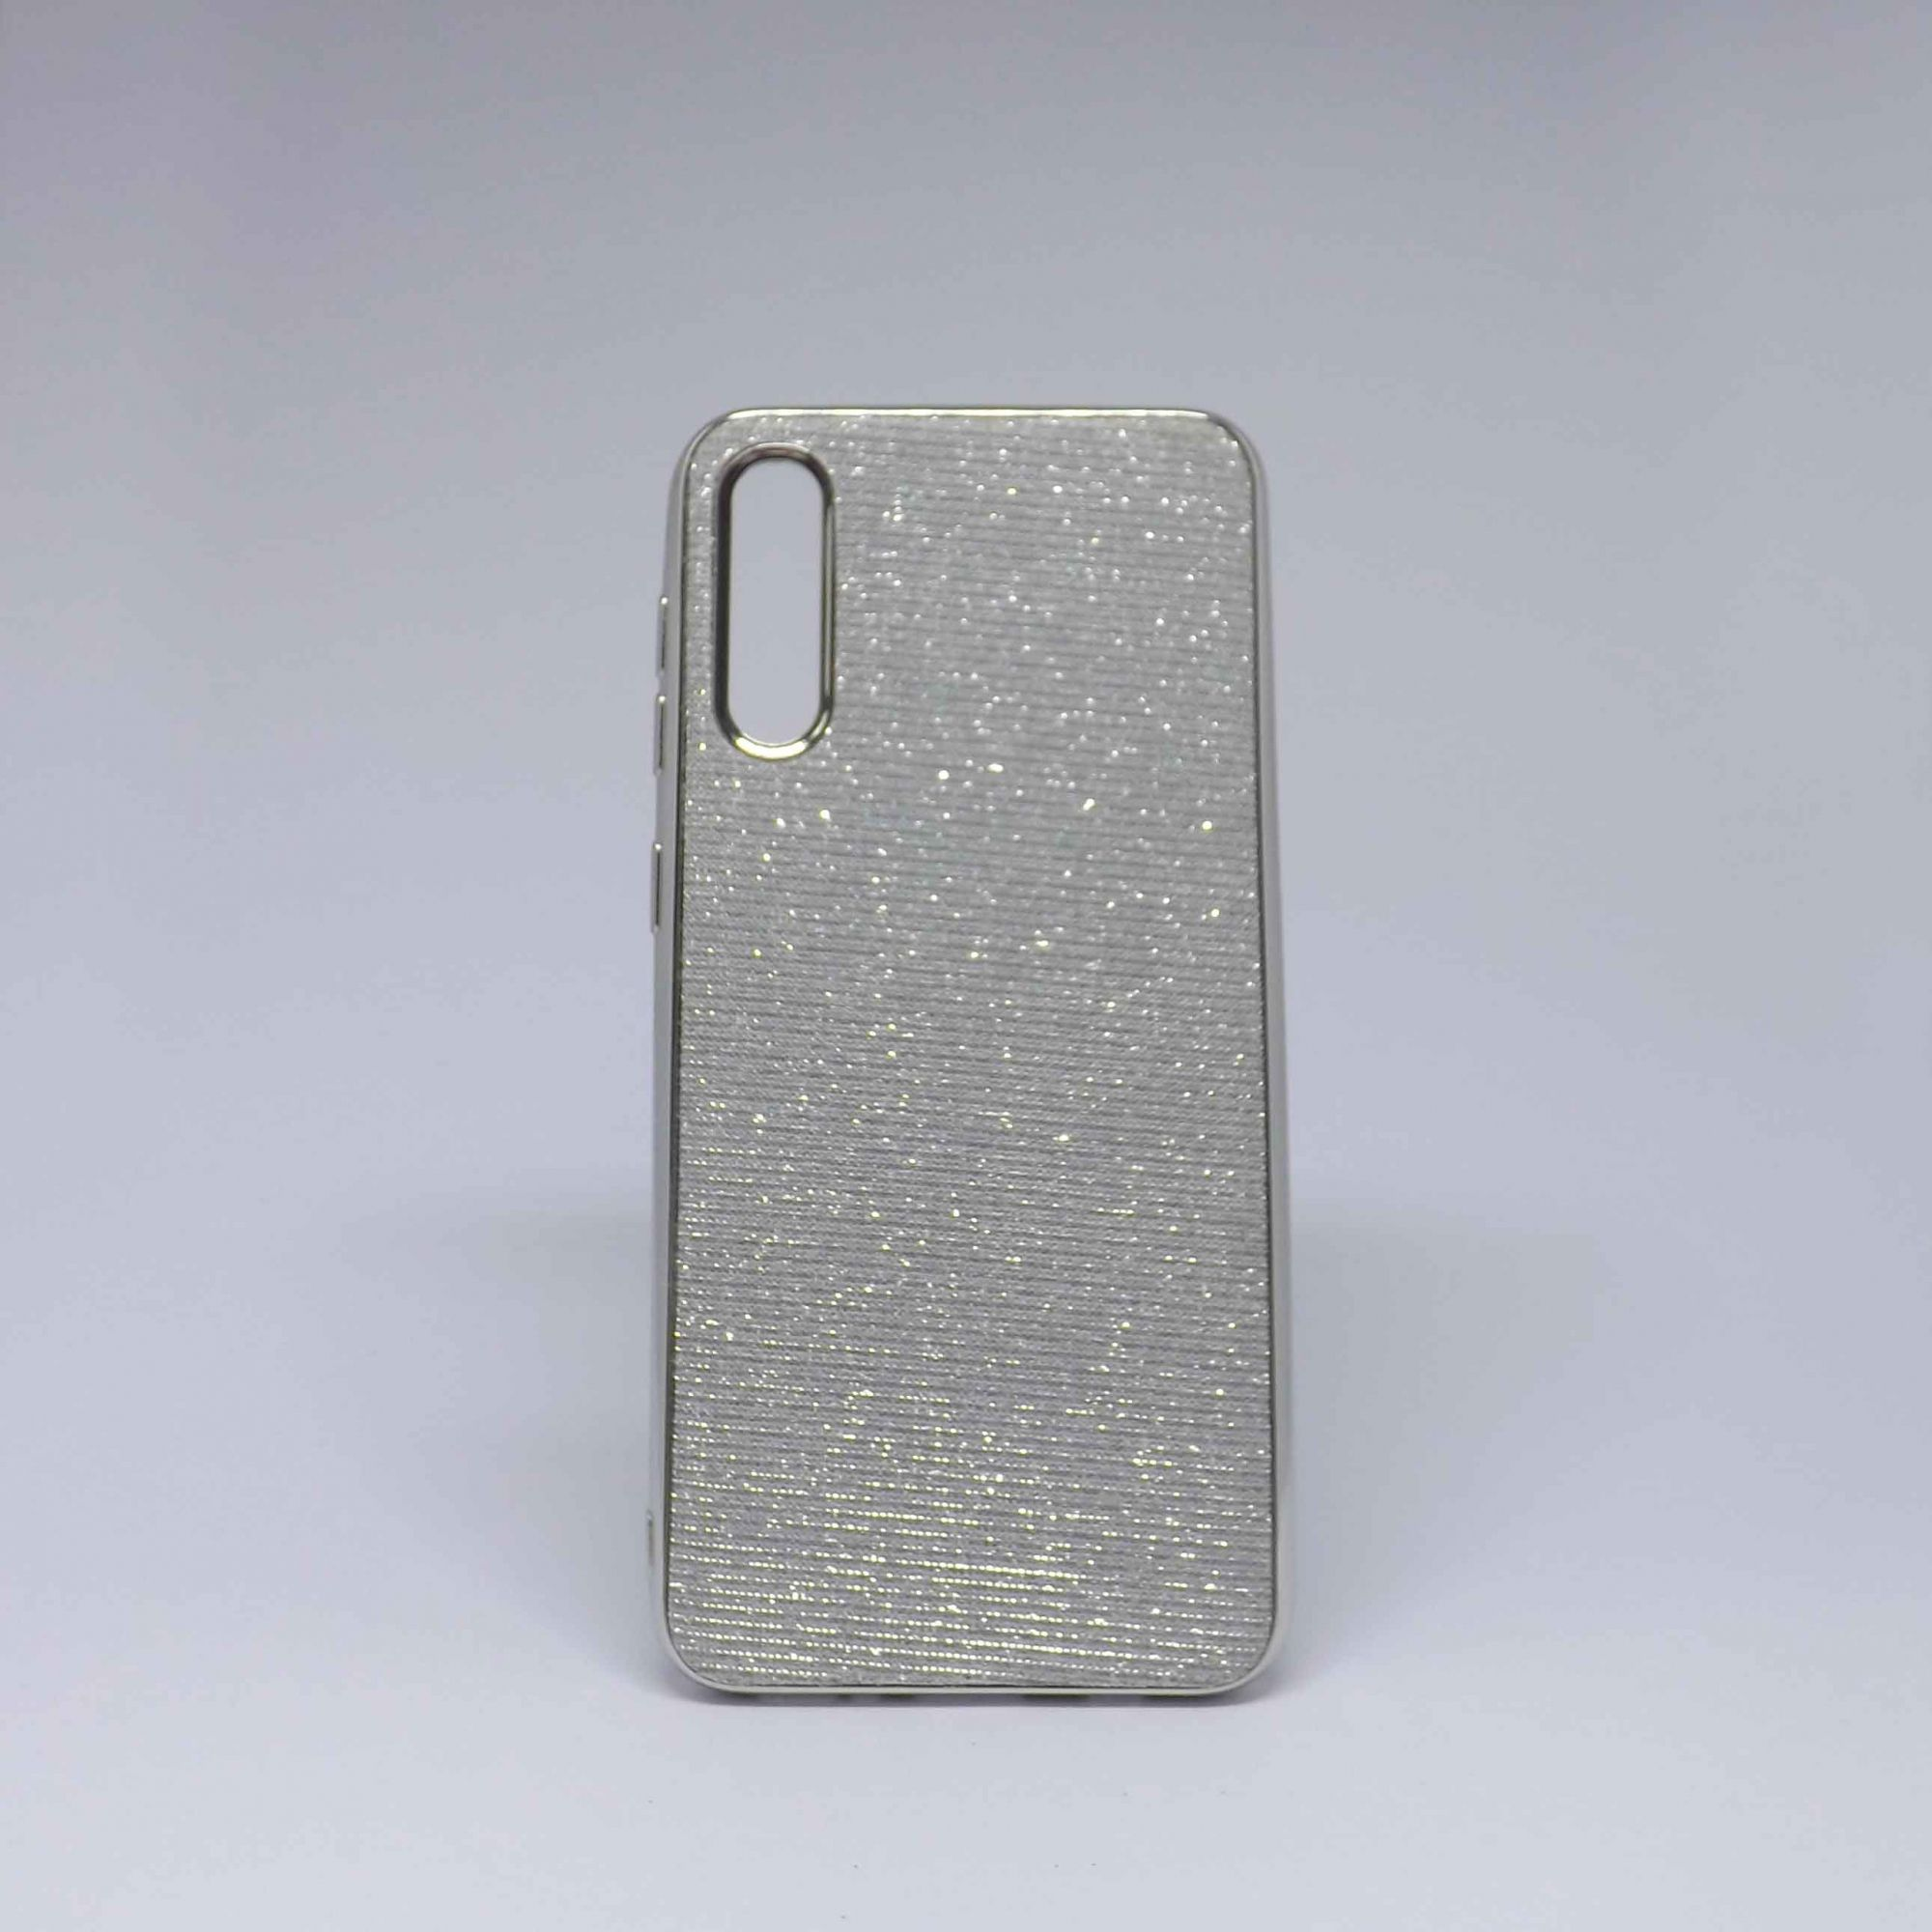 Capa Samsung Galaxy A50/A30s Strass